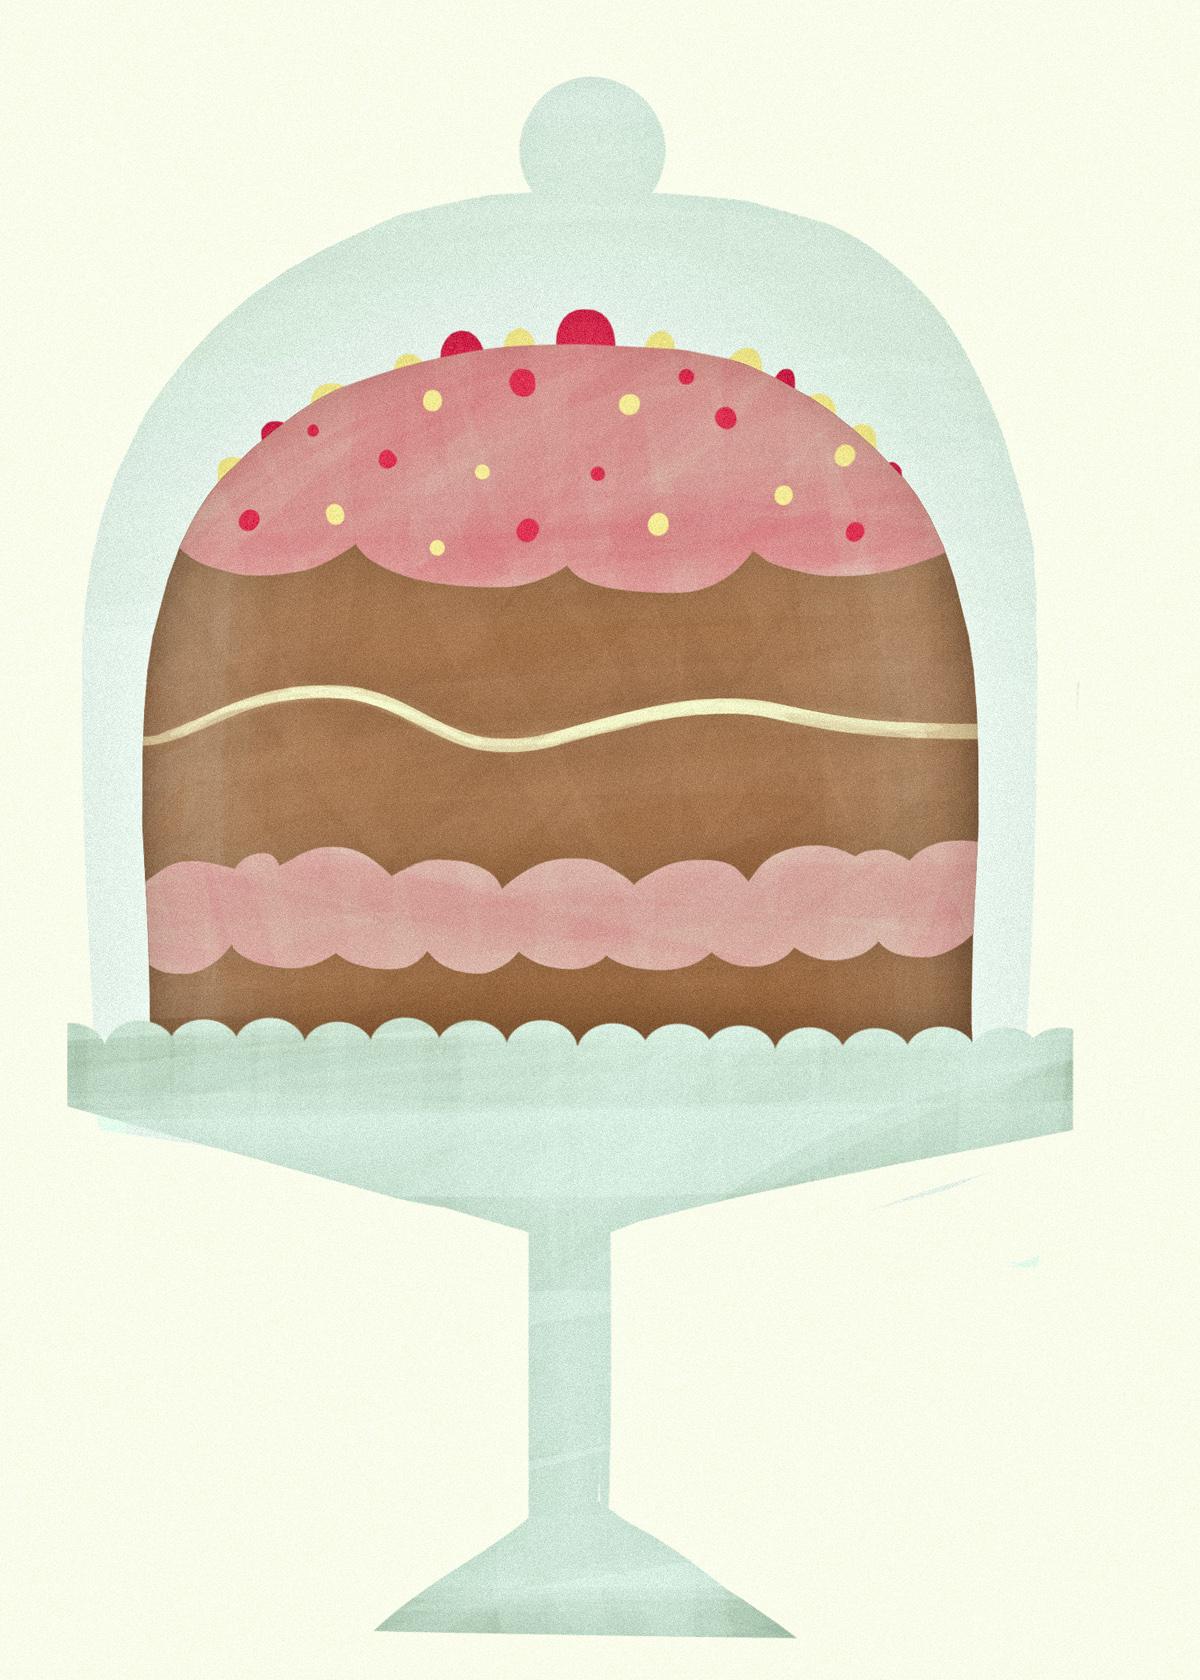 Cake Sarahgoodreau